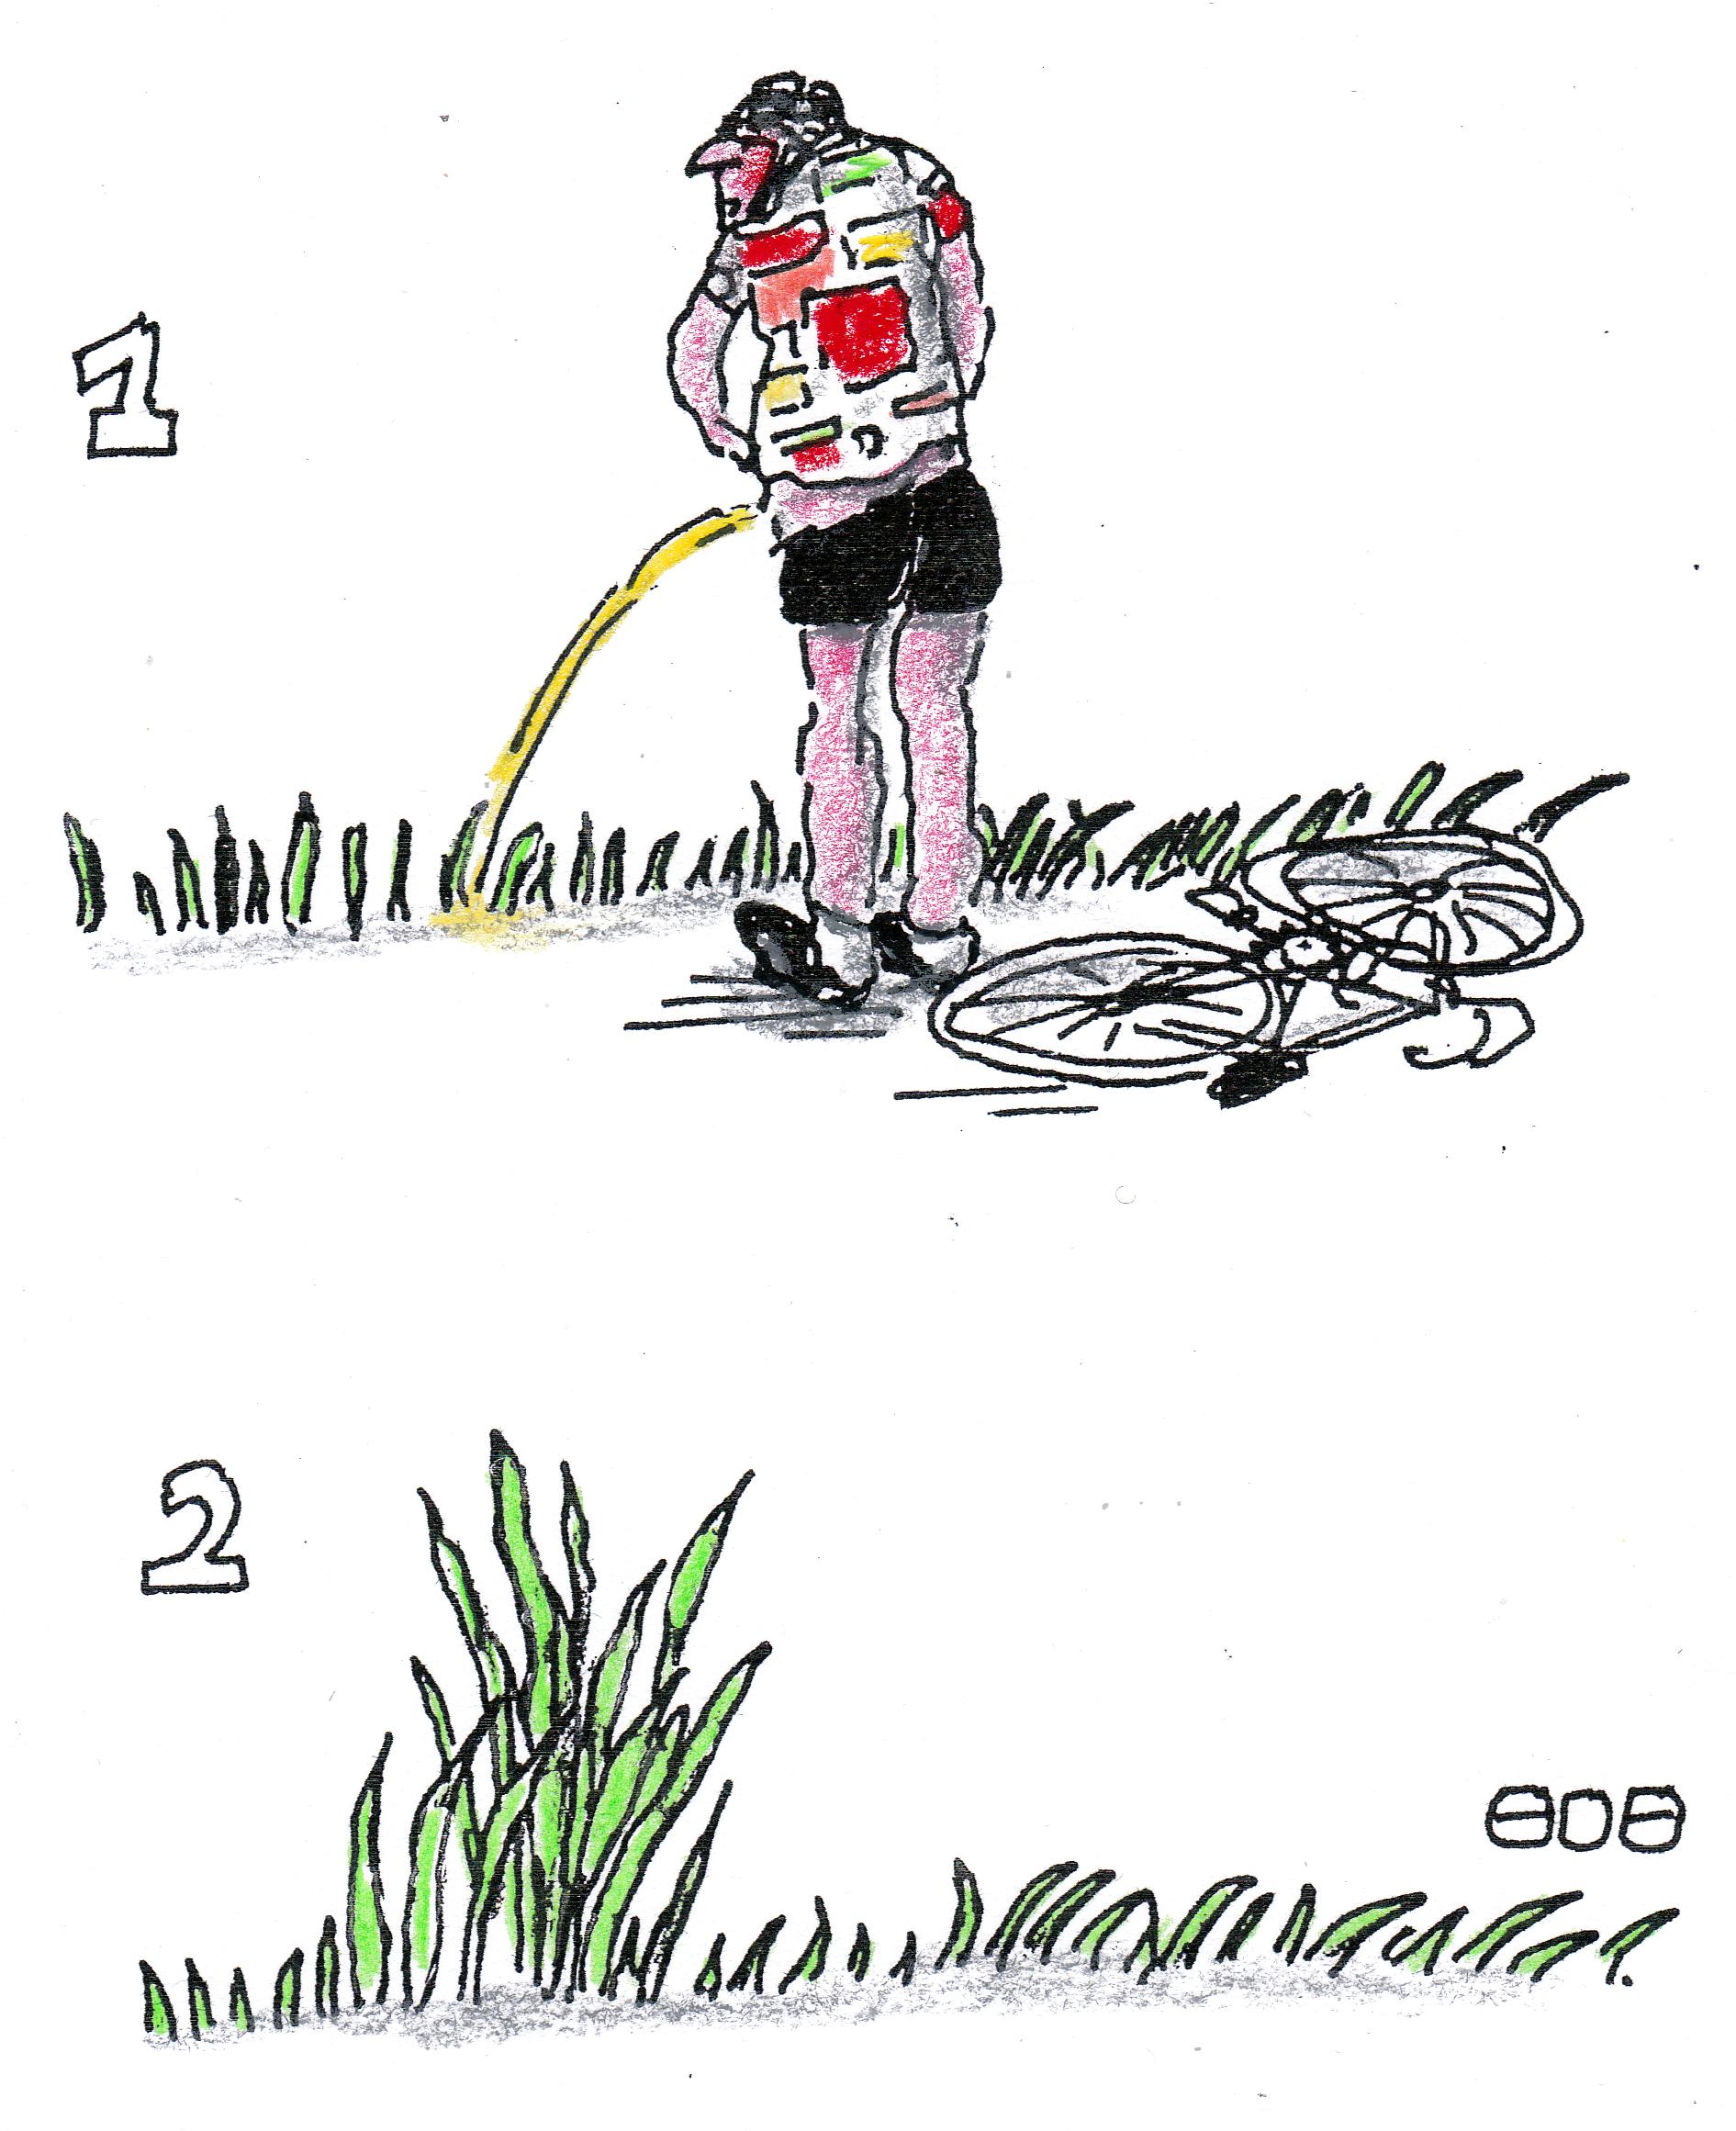 Doping fietser